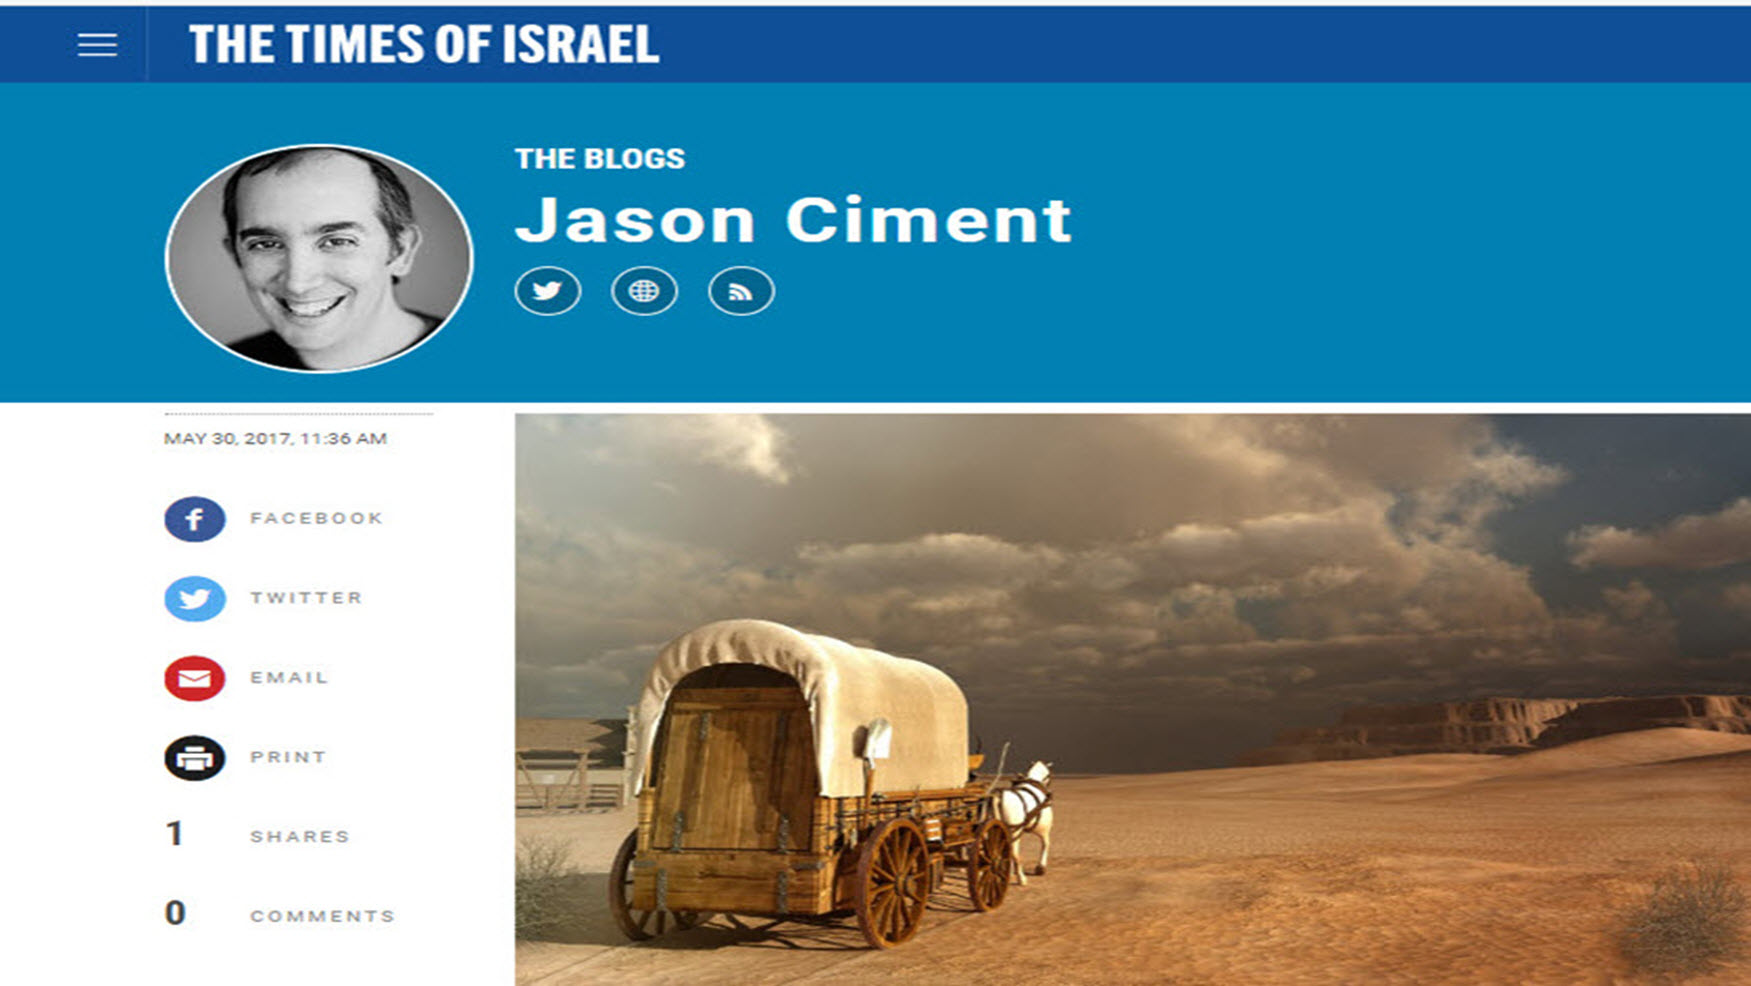 Times of Israel Blog